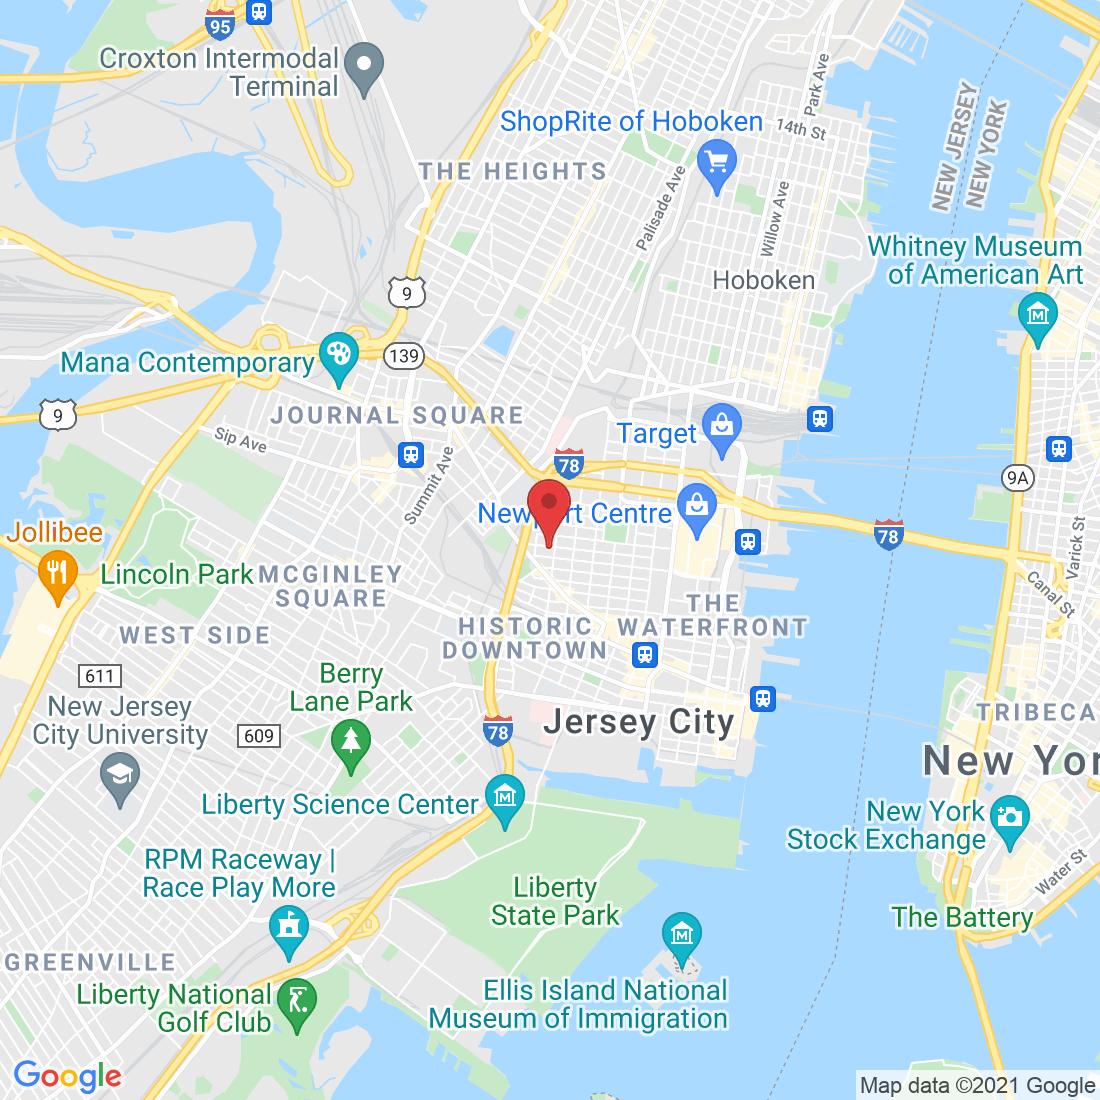 189 Brunswick St, Jersey City, NJ 07302, USA